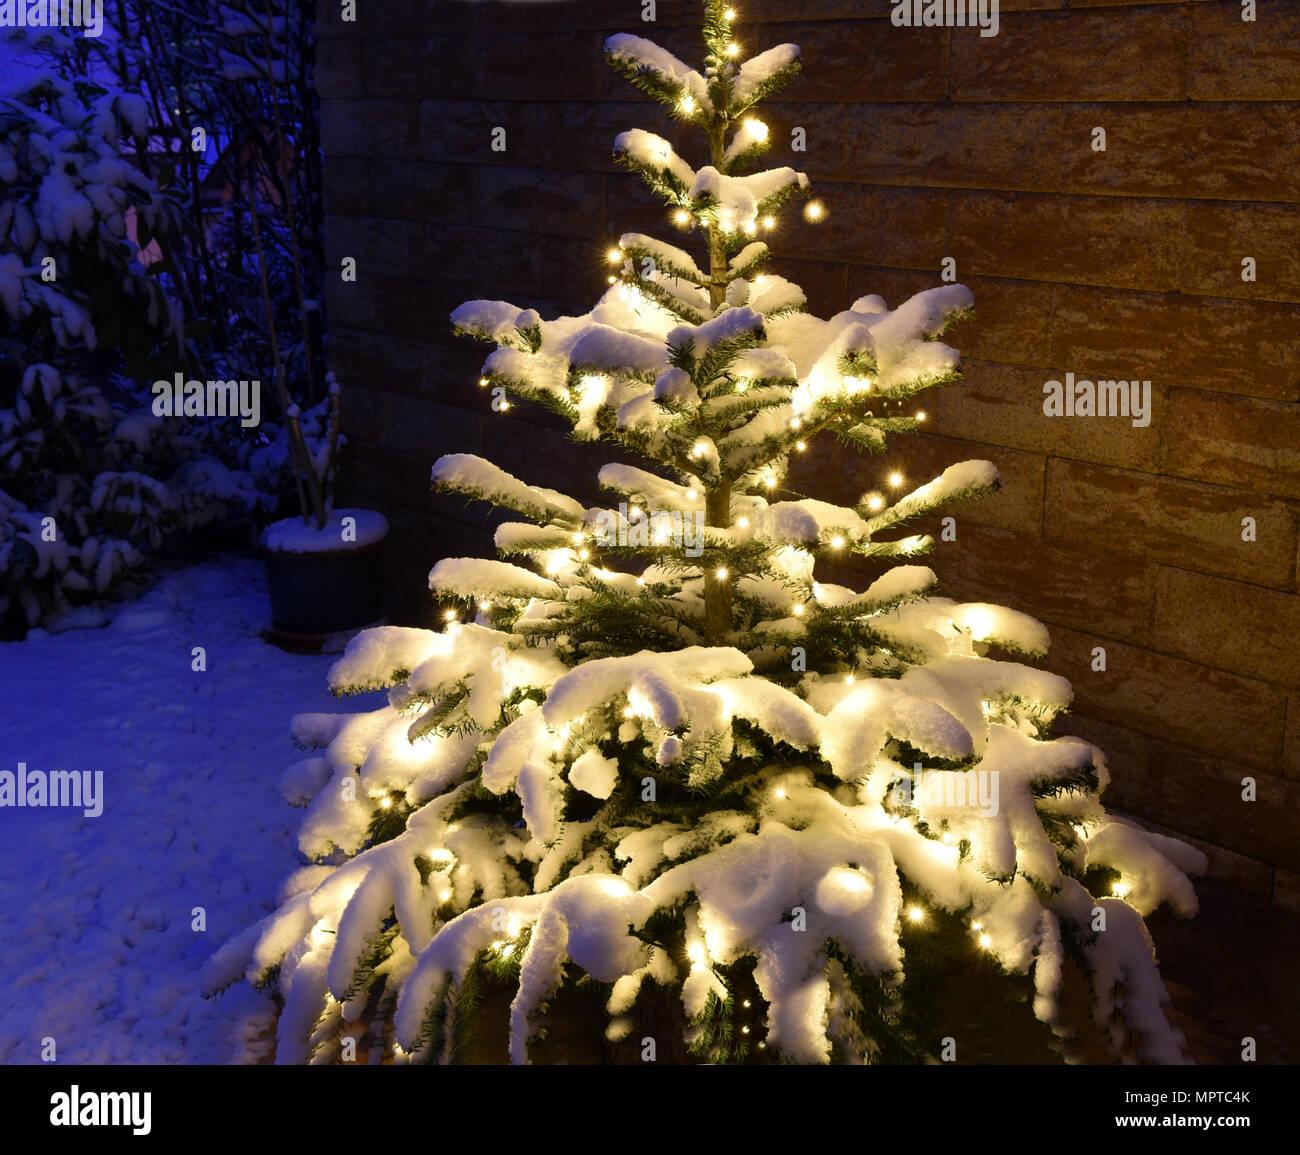 Weihnachtsbaum Tannenbaum.Weihnachtsbaum Tannenbaum Christbaum Stock Photo 186162499 Alamy